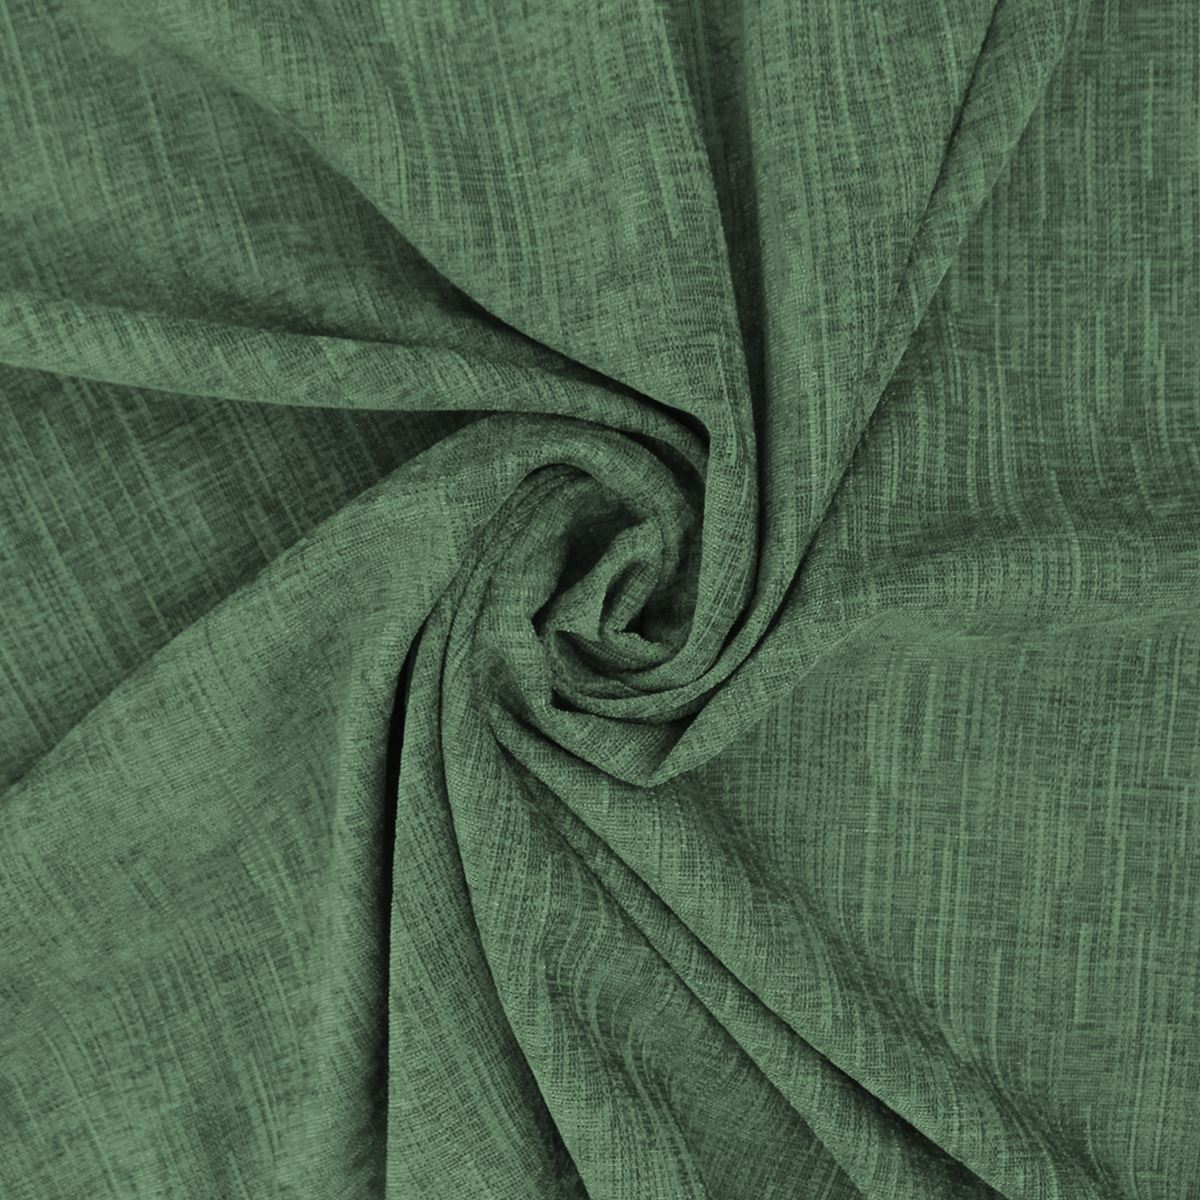 034-Chenille-034-Slubbed-Shabby-Worn-Look-Curtain-Cushion-Sofa-Upholstery-Fabric thumbnail 50